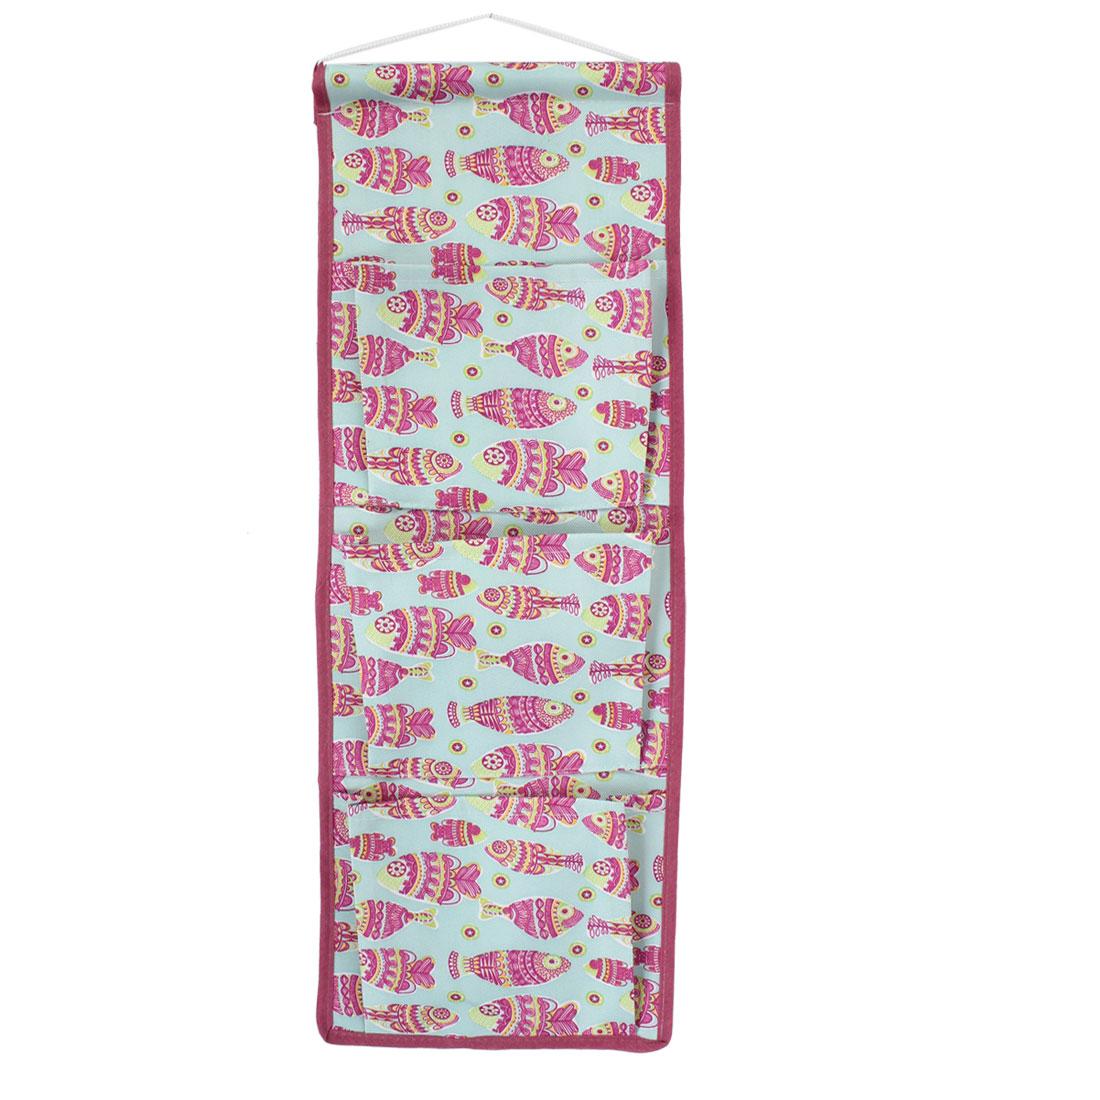 Wall Door Closet 3 Pockets Hanging Storage Bag Case